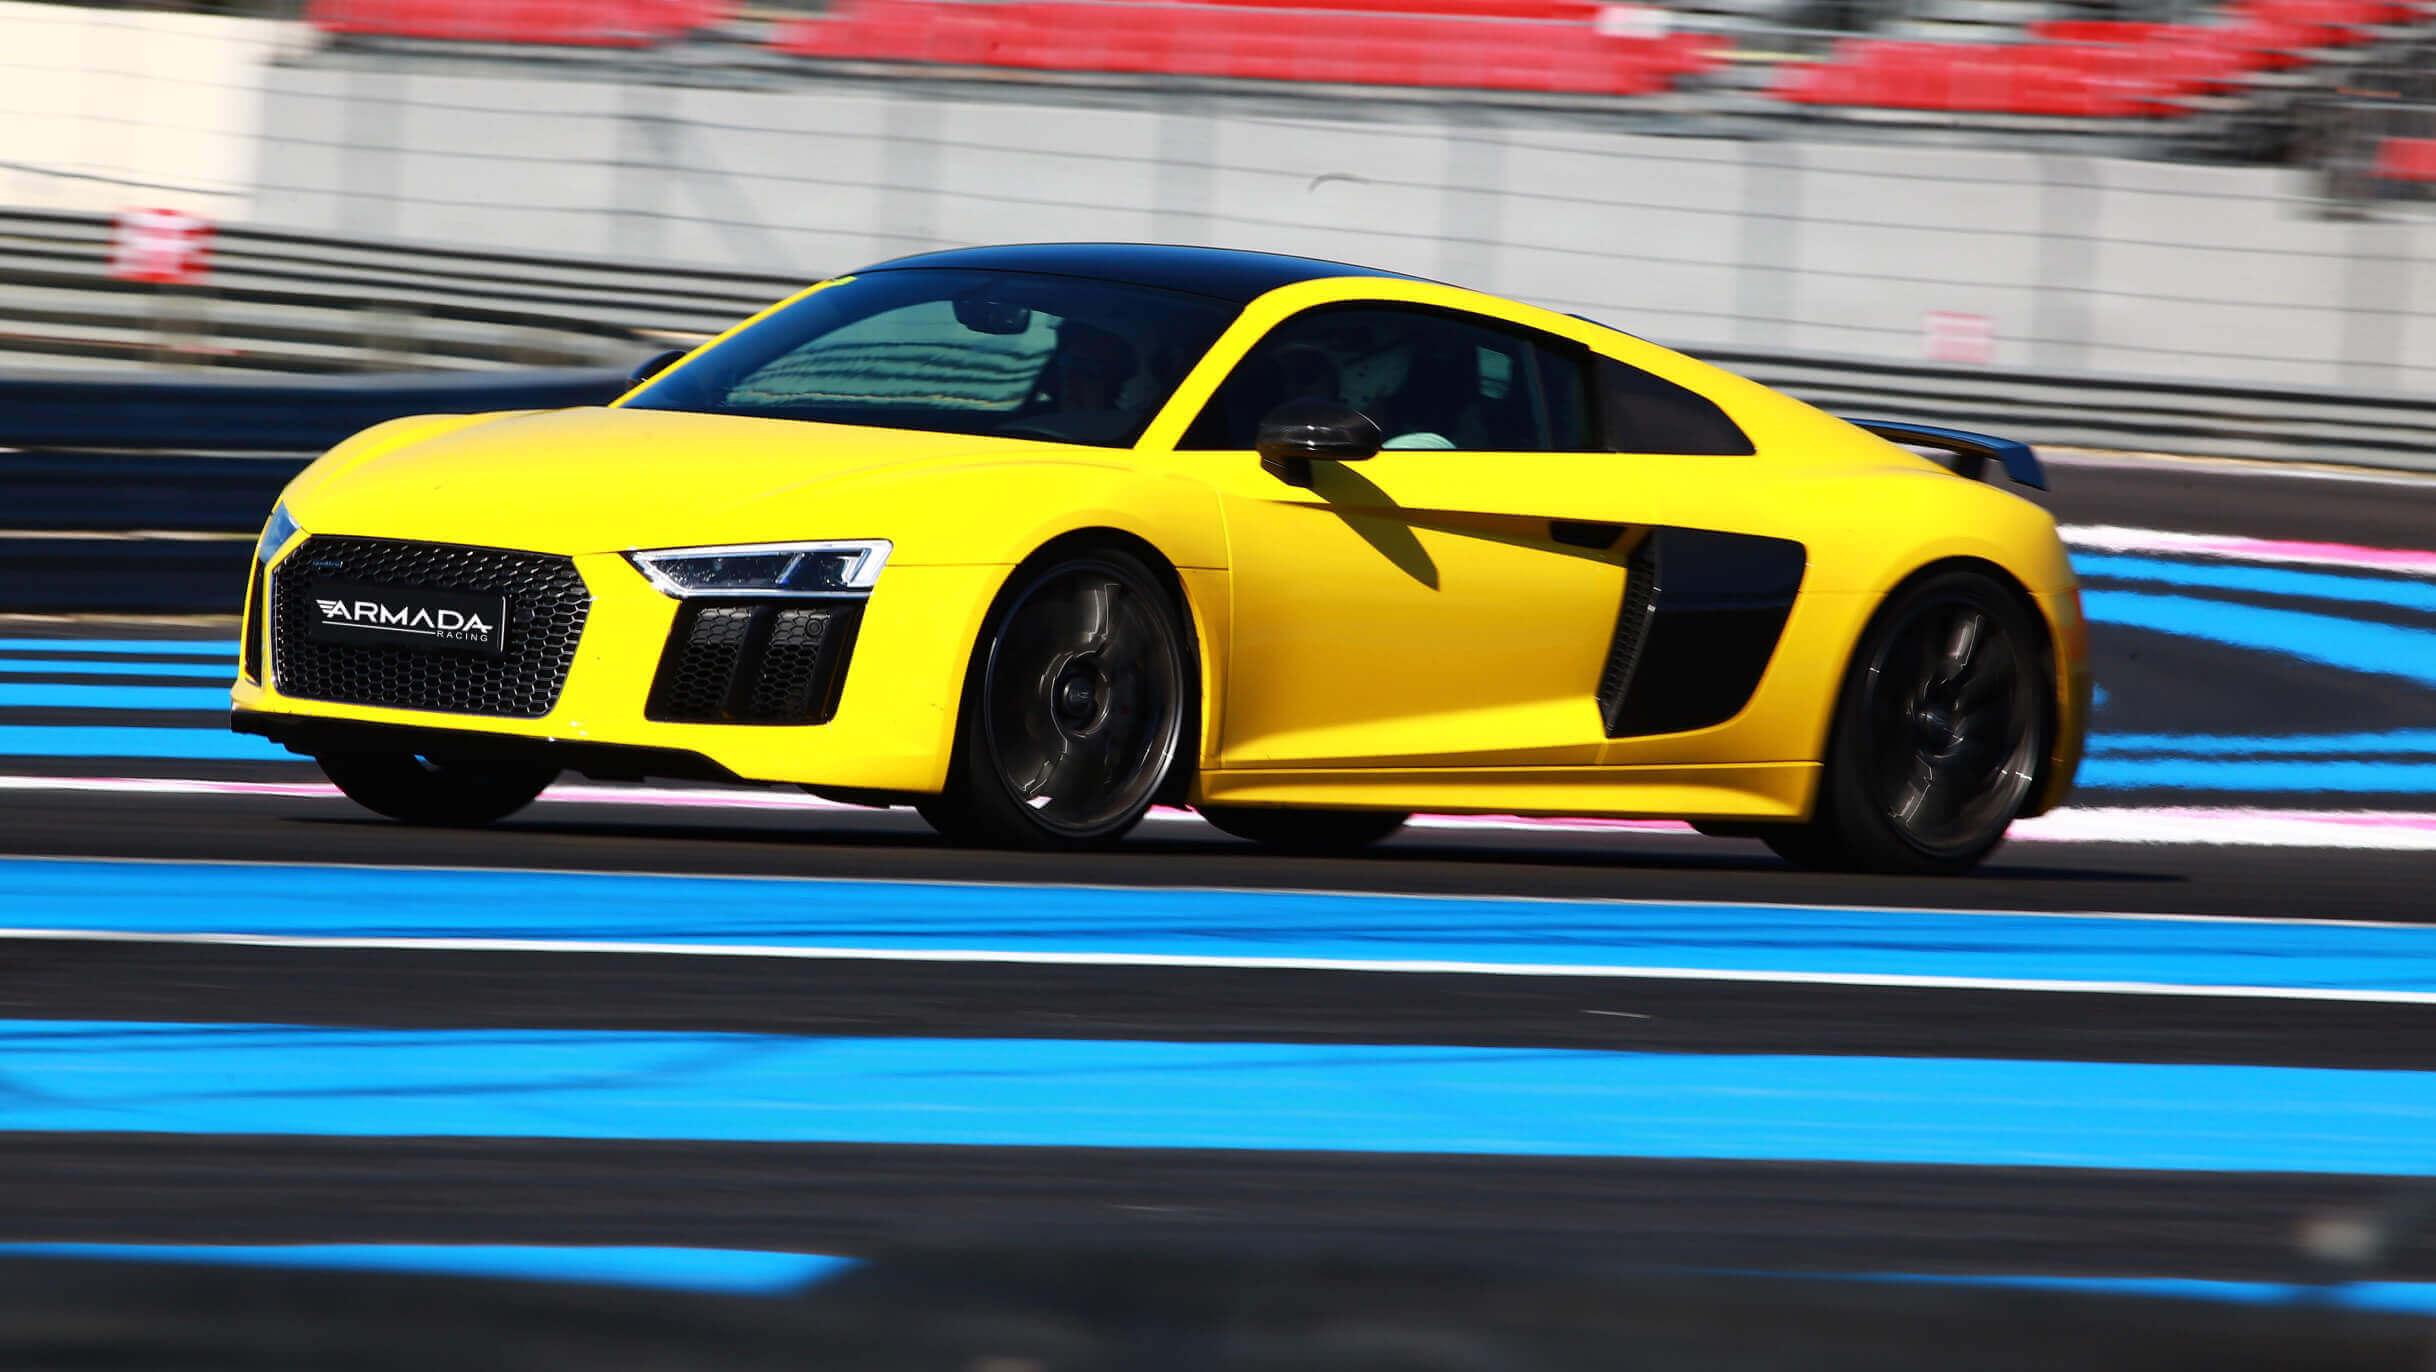 armada-racing-location-voiture-prestige-supercar-sportive-limoges